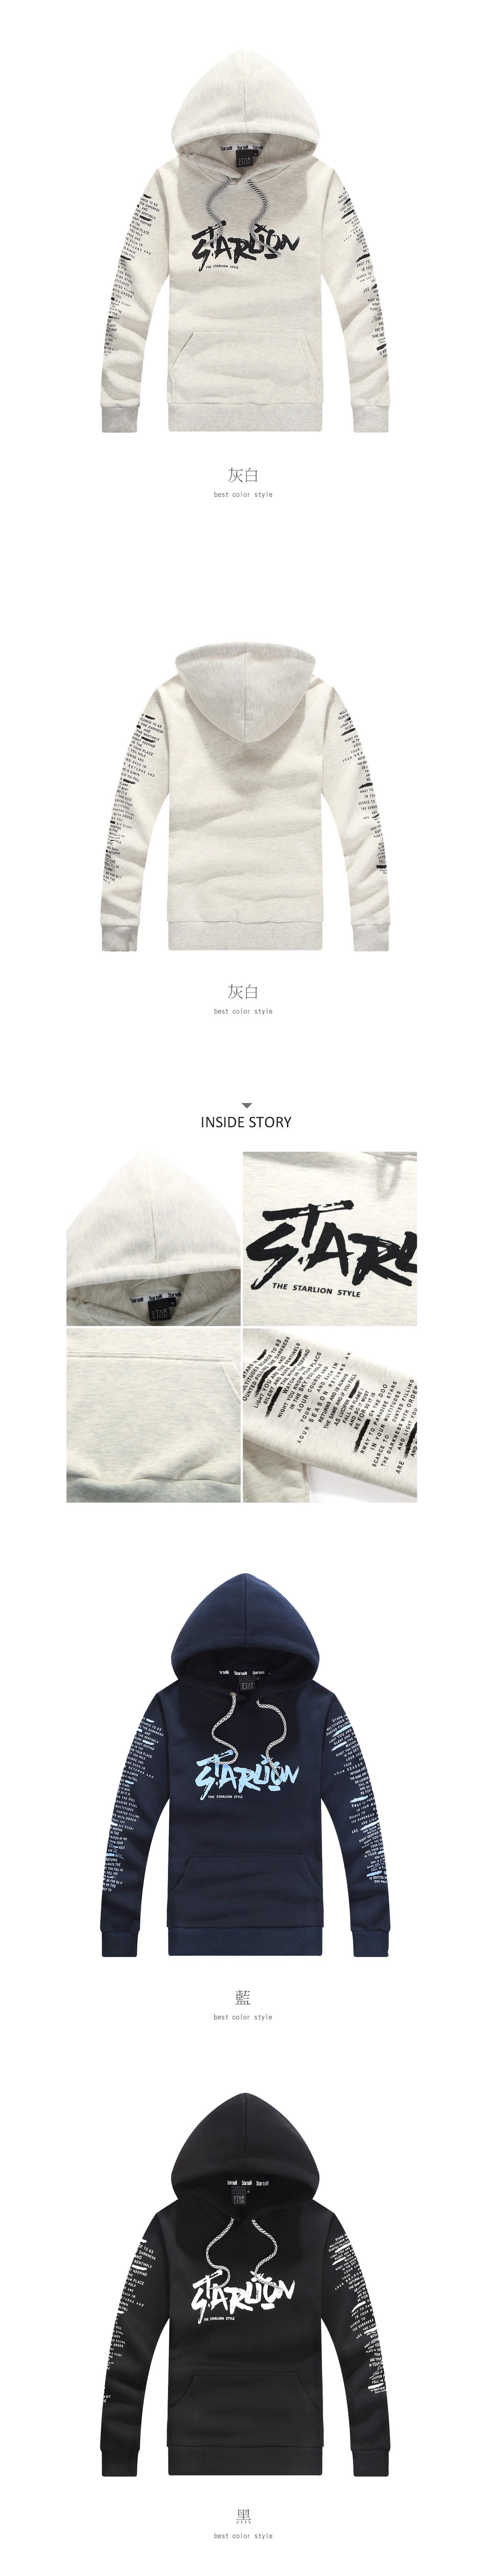 STARLINE.雙臂草寫英文刷毛連帽T